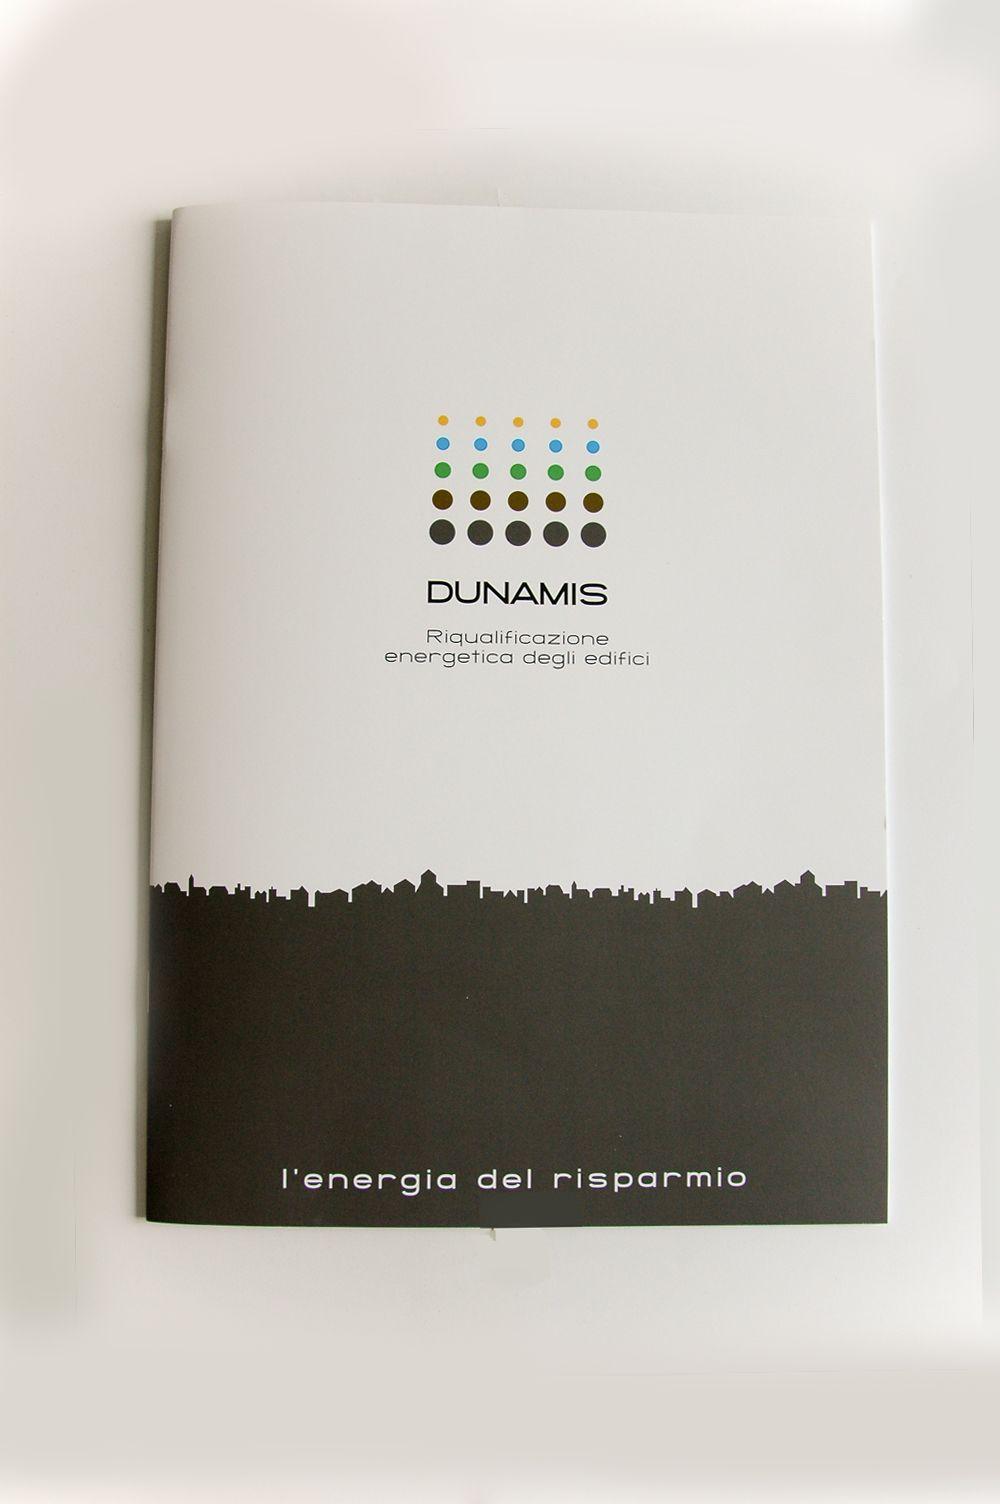 Borchure http://www.e-dna.it/portfolio-item/dunamis-brochure-logo-naming